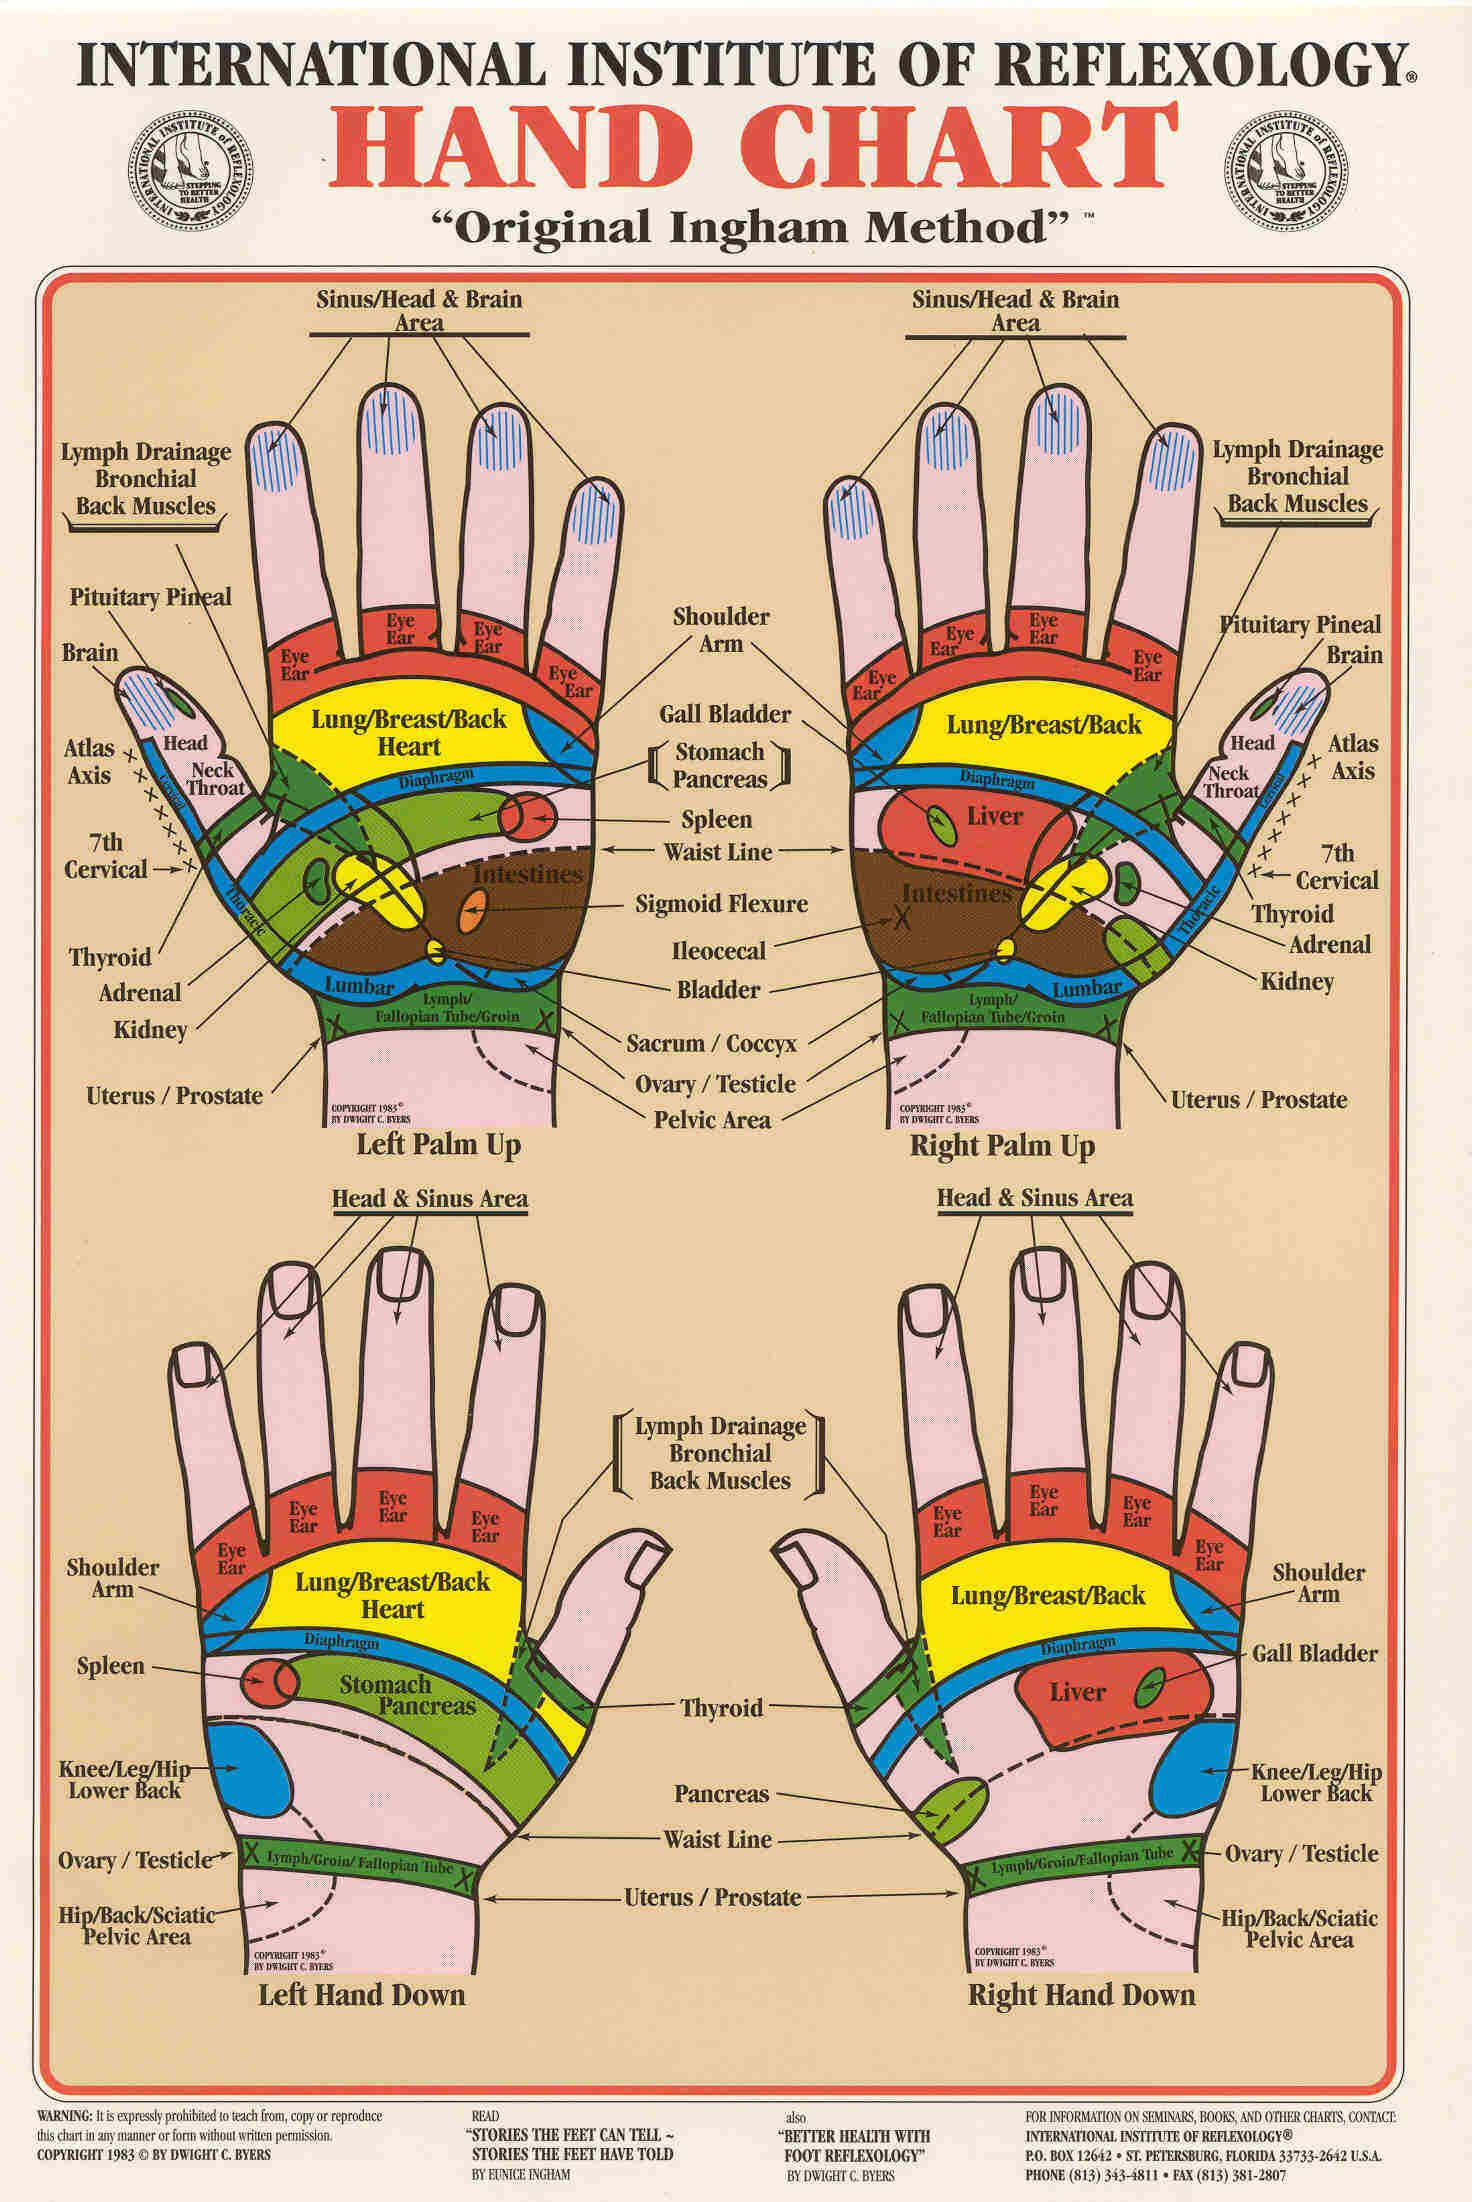 Reflexology www.acupunctureconnections.com | Reflexology, Hand ...